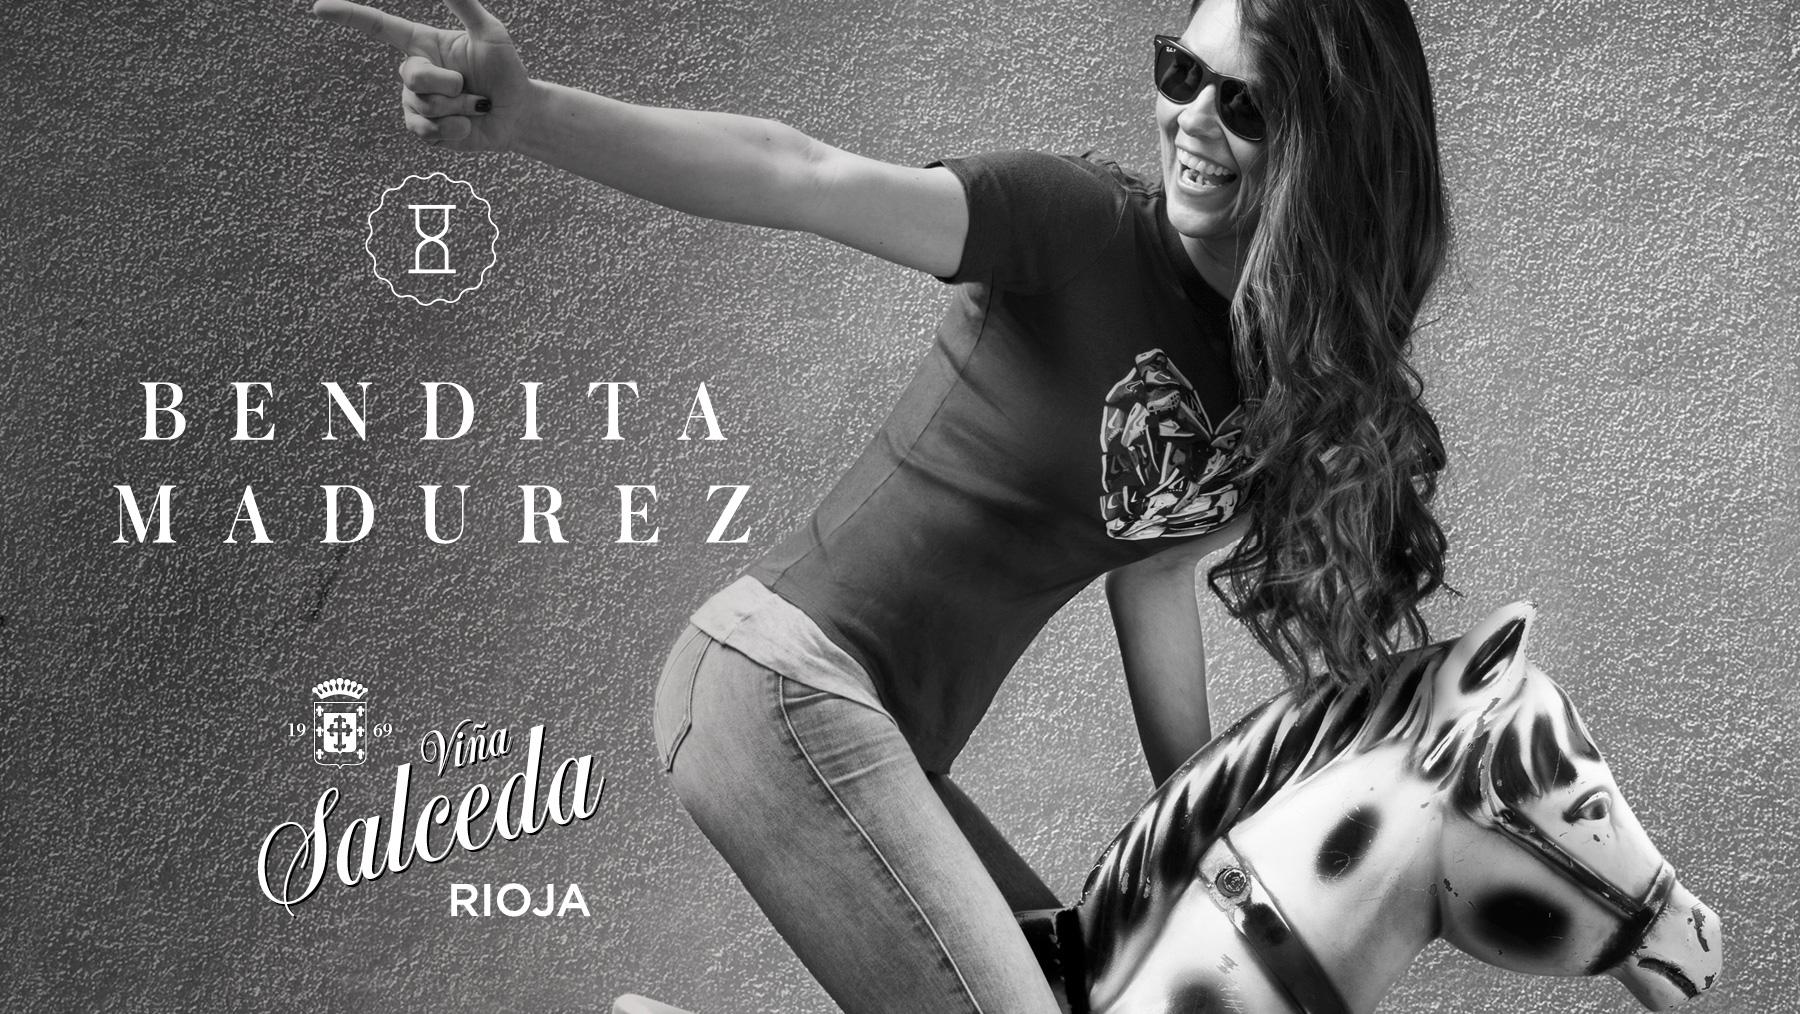 BENDITA-MADUREZ3